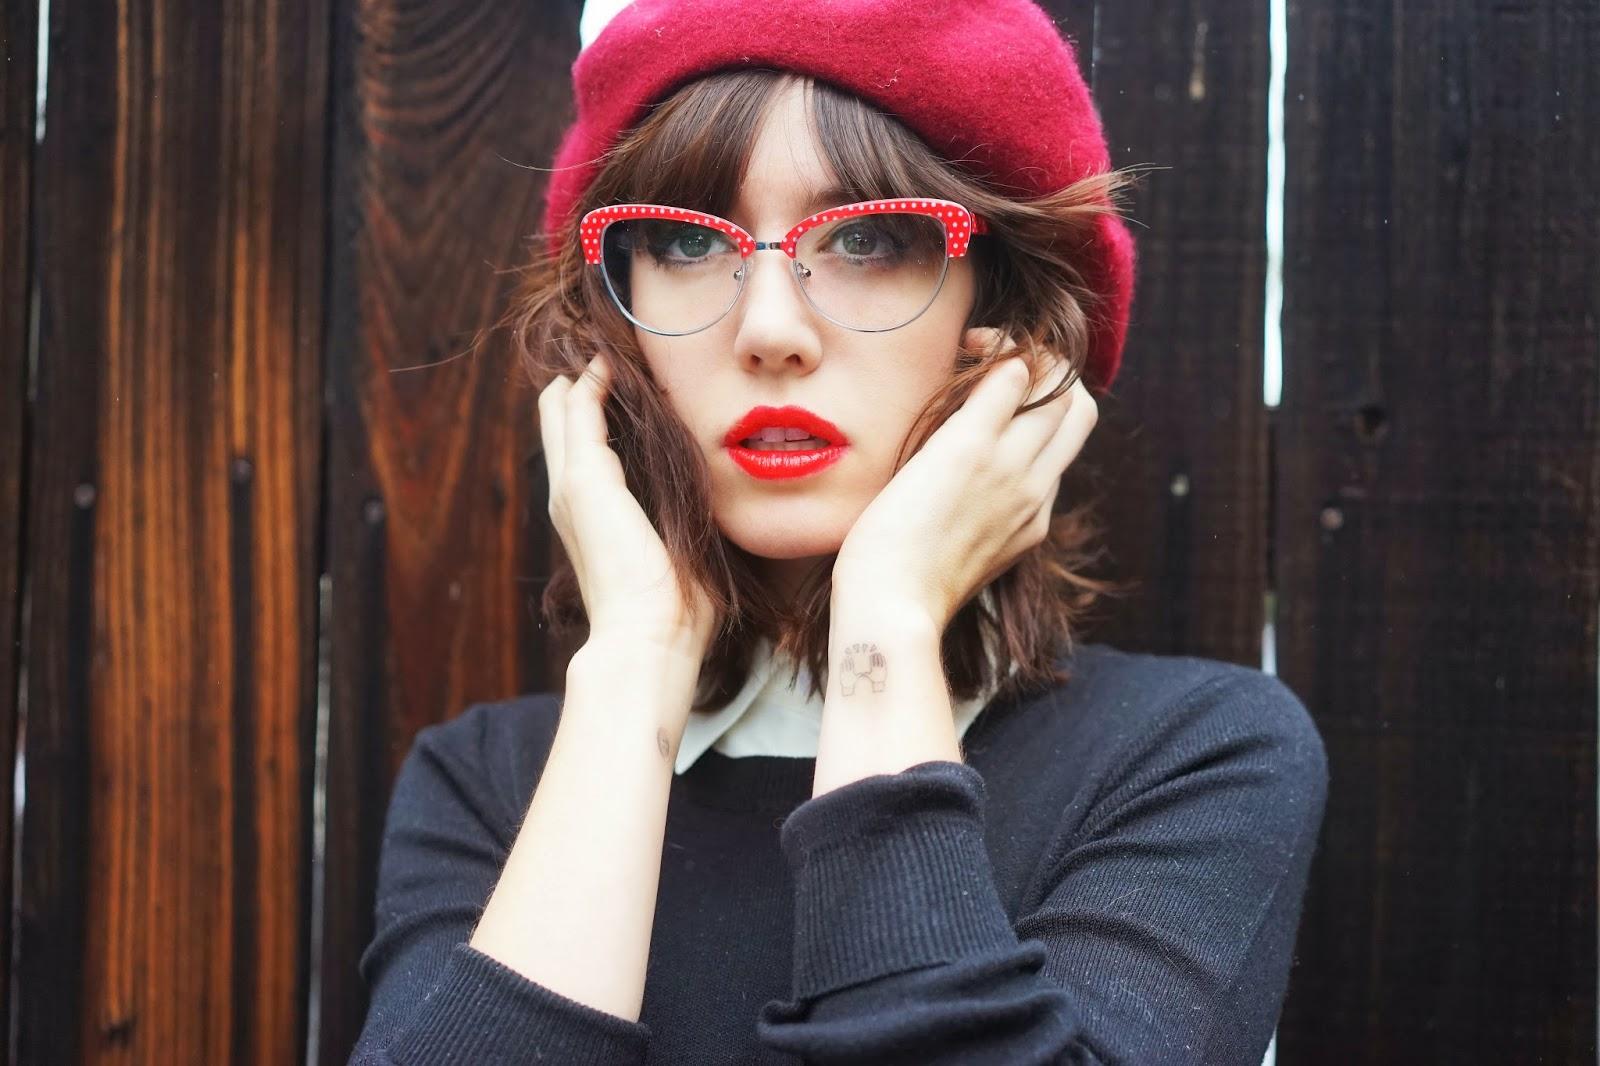 eyewear trends 2015  Interview with A Fashion Nerd